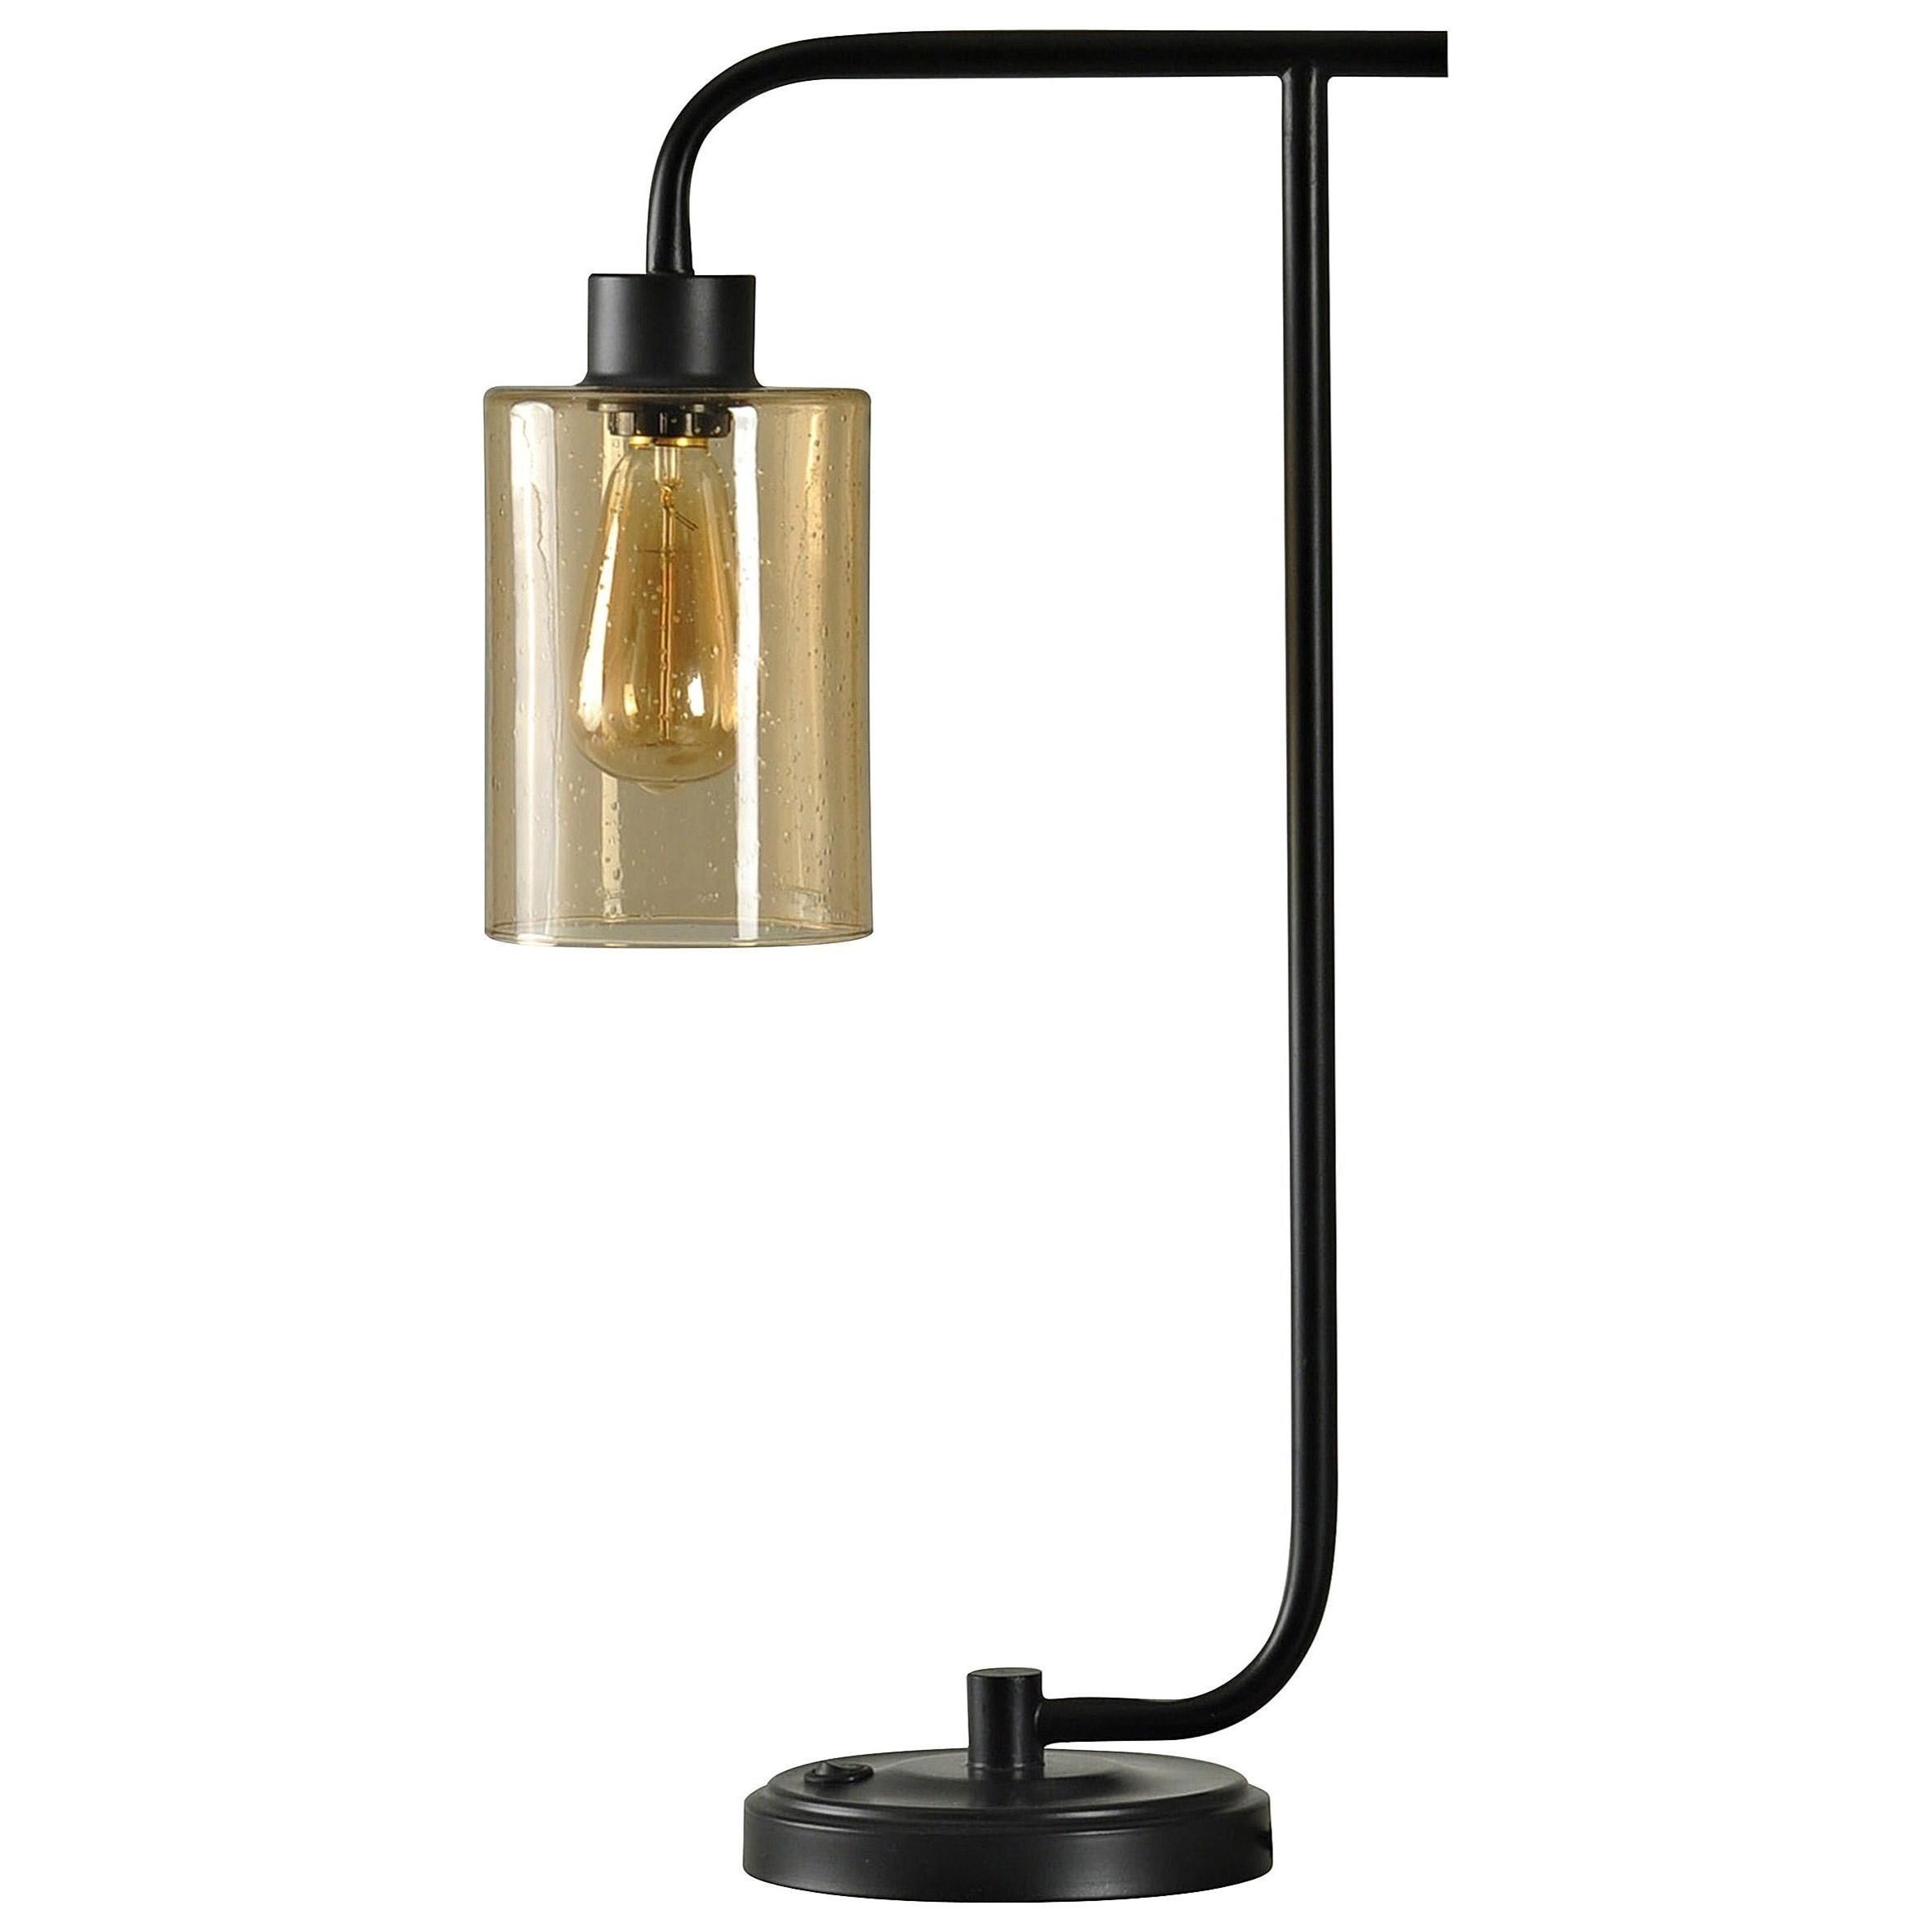 StyleCraft Lamps Glass And Metal Desk Lamp   Hudsonu0027s Furniture   Desk Lamps